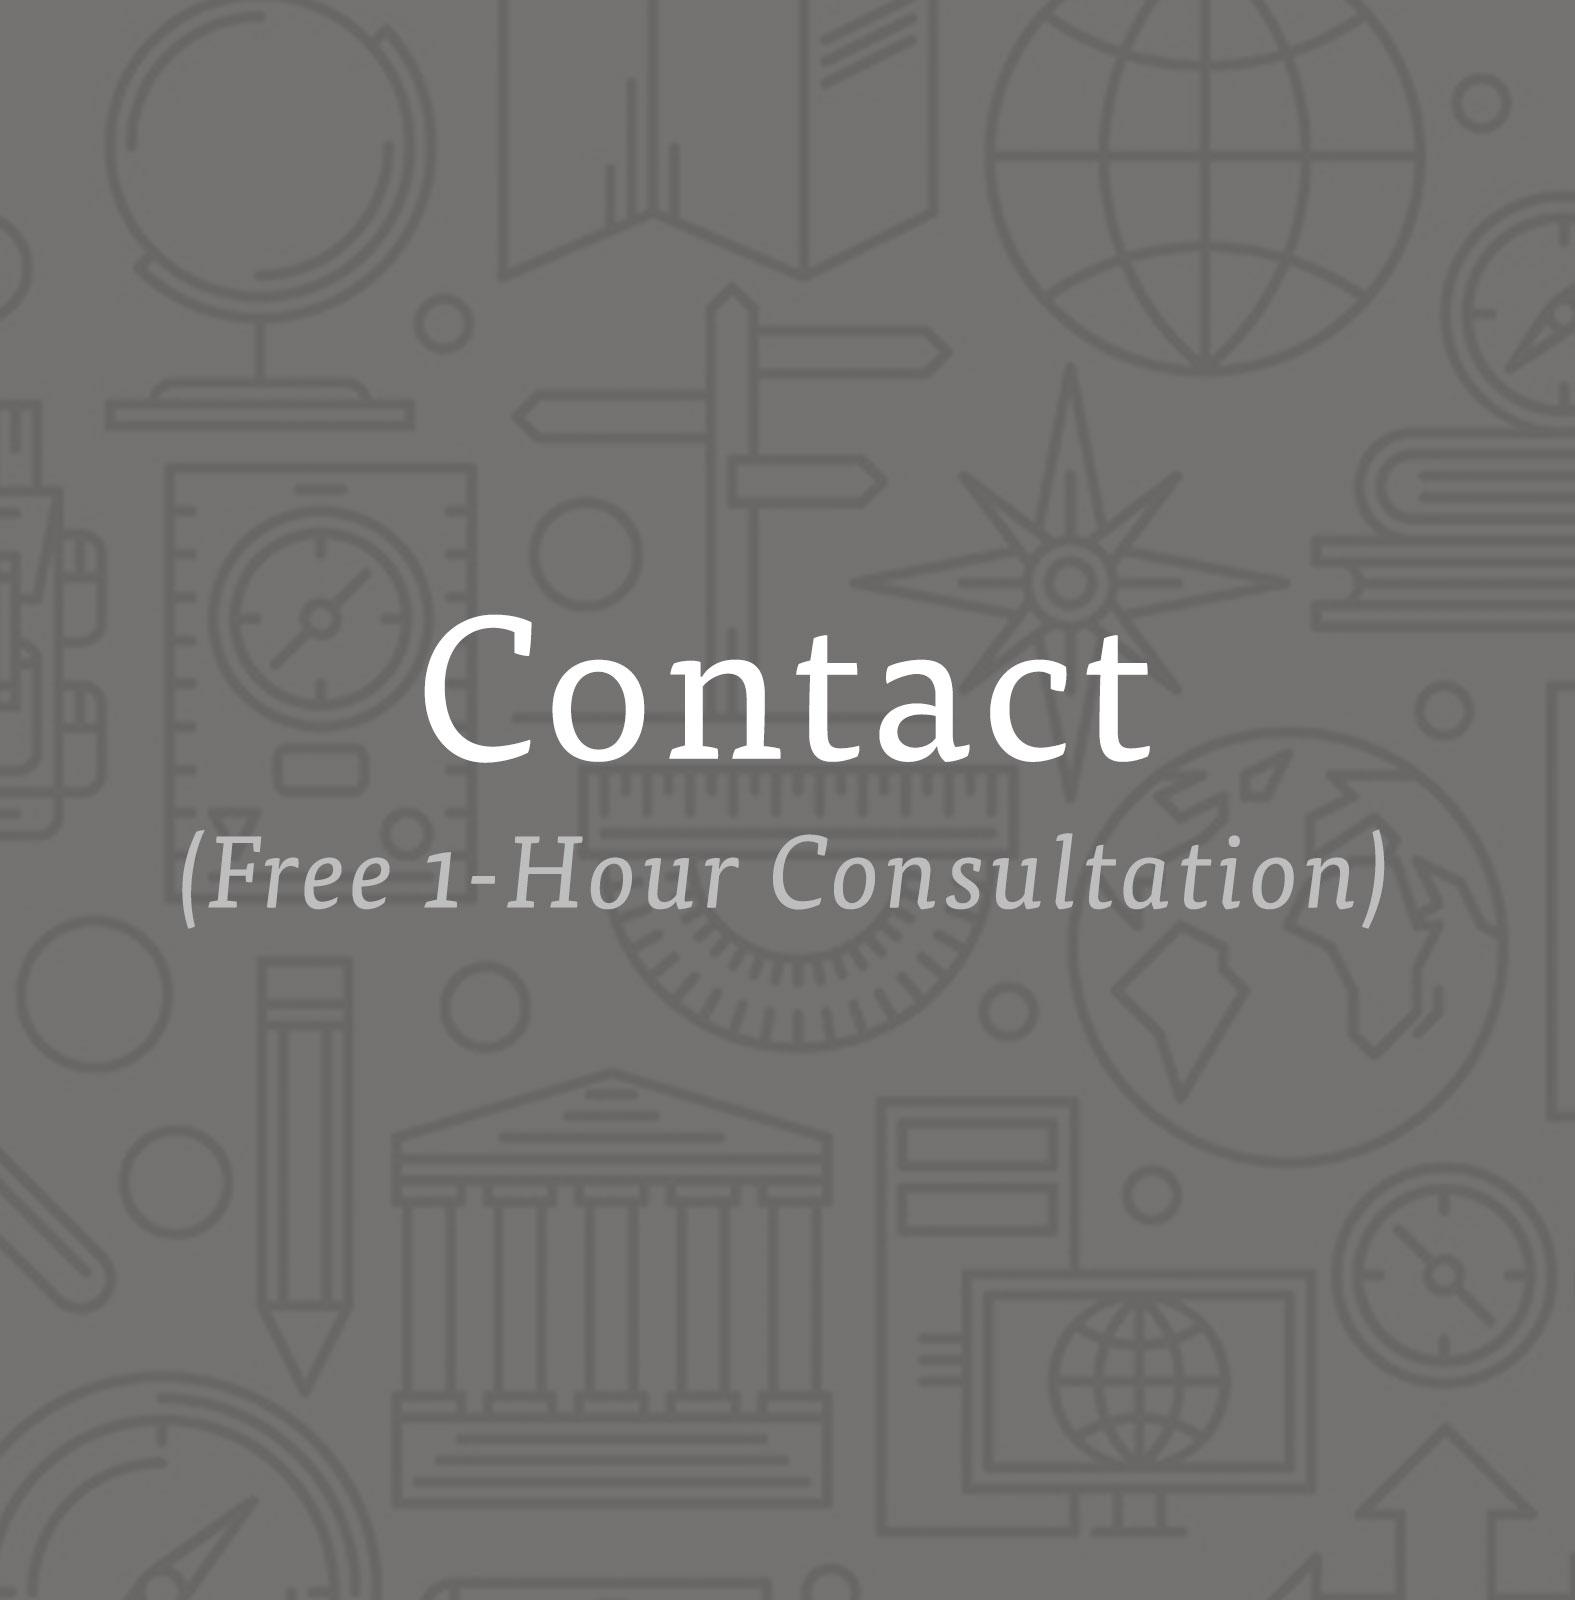 Contact_2.jpg